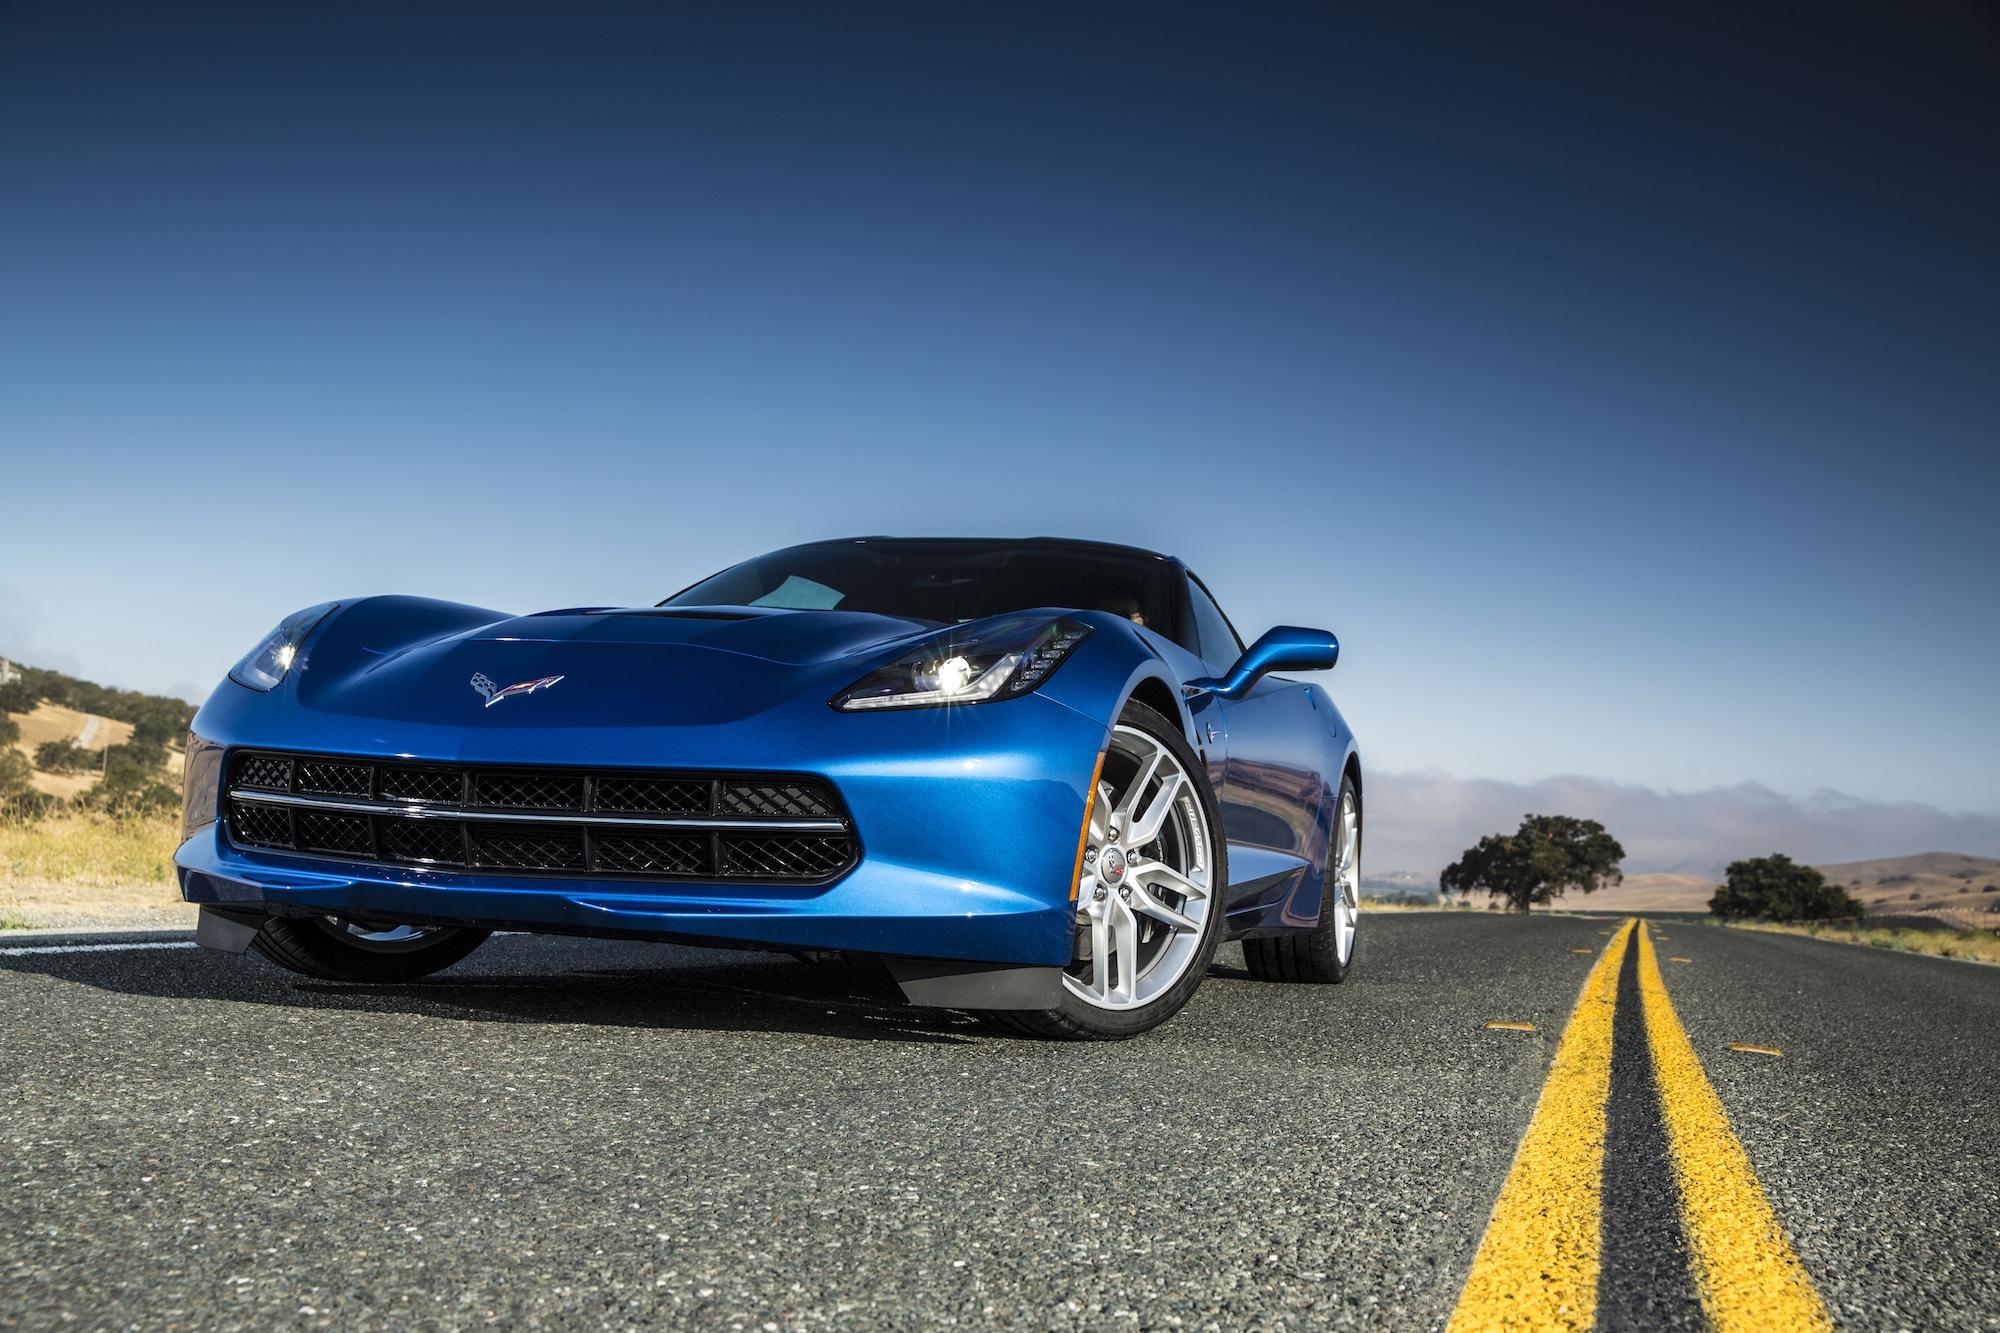 2014 Chevy Corvette Stingray Configurator Goes Live Mostly